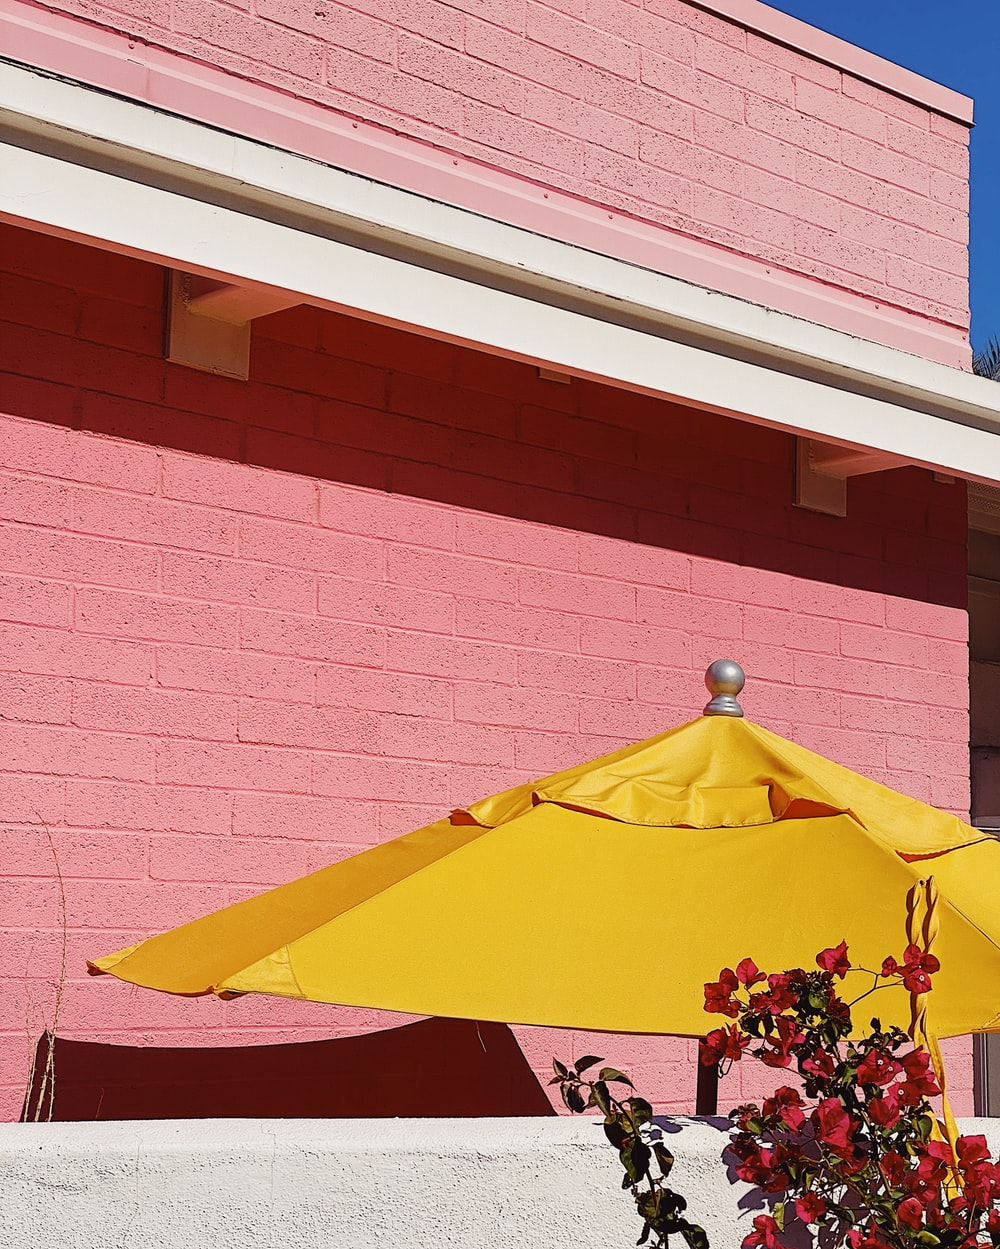 red and yellow umbrella near brown brick wall